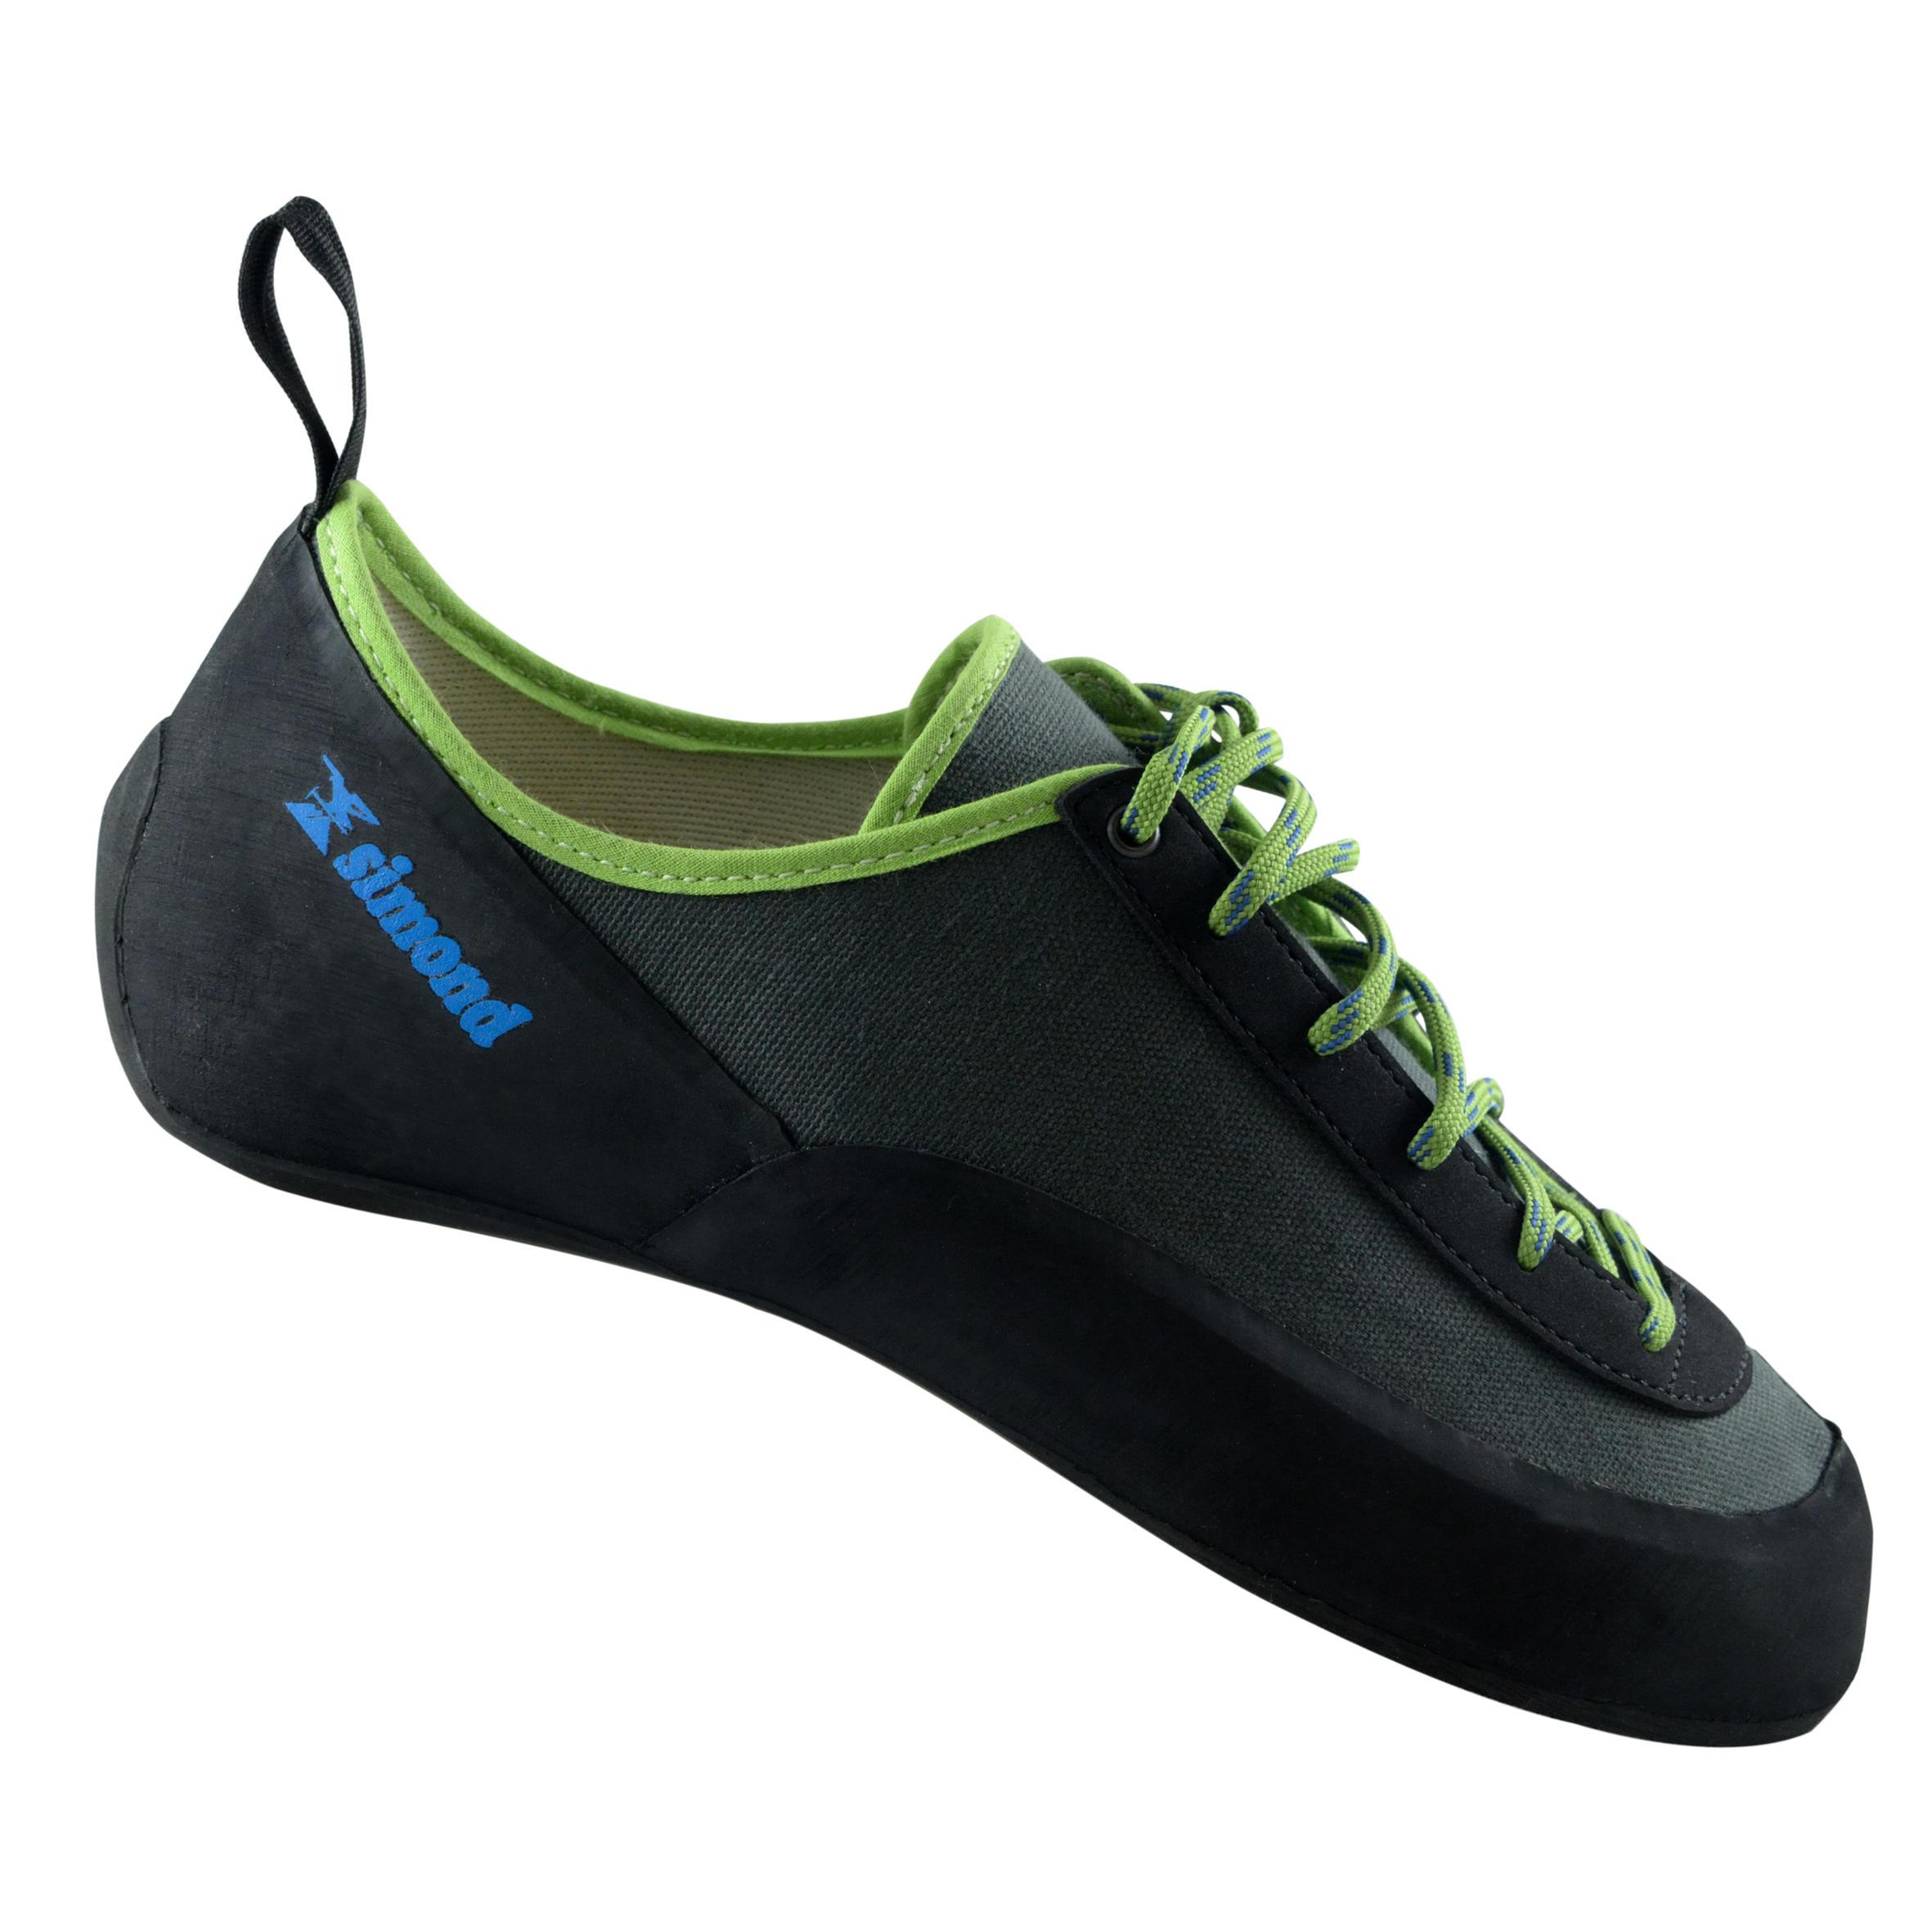 Kletterschuhe Rock+ Erwachsene grau | Schuhe > Outdoorschuhe > Kletterschuhe | Grau - Schwarz - Grün | Simond